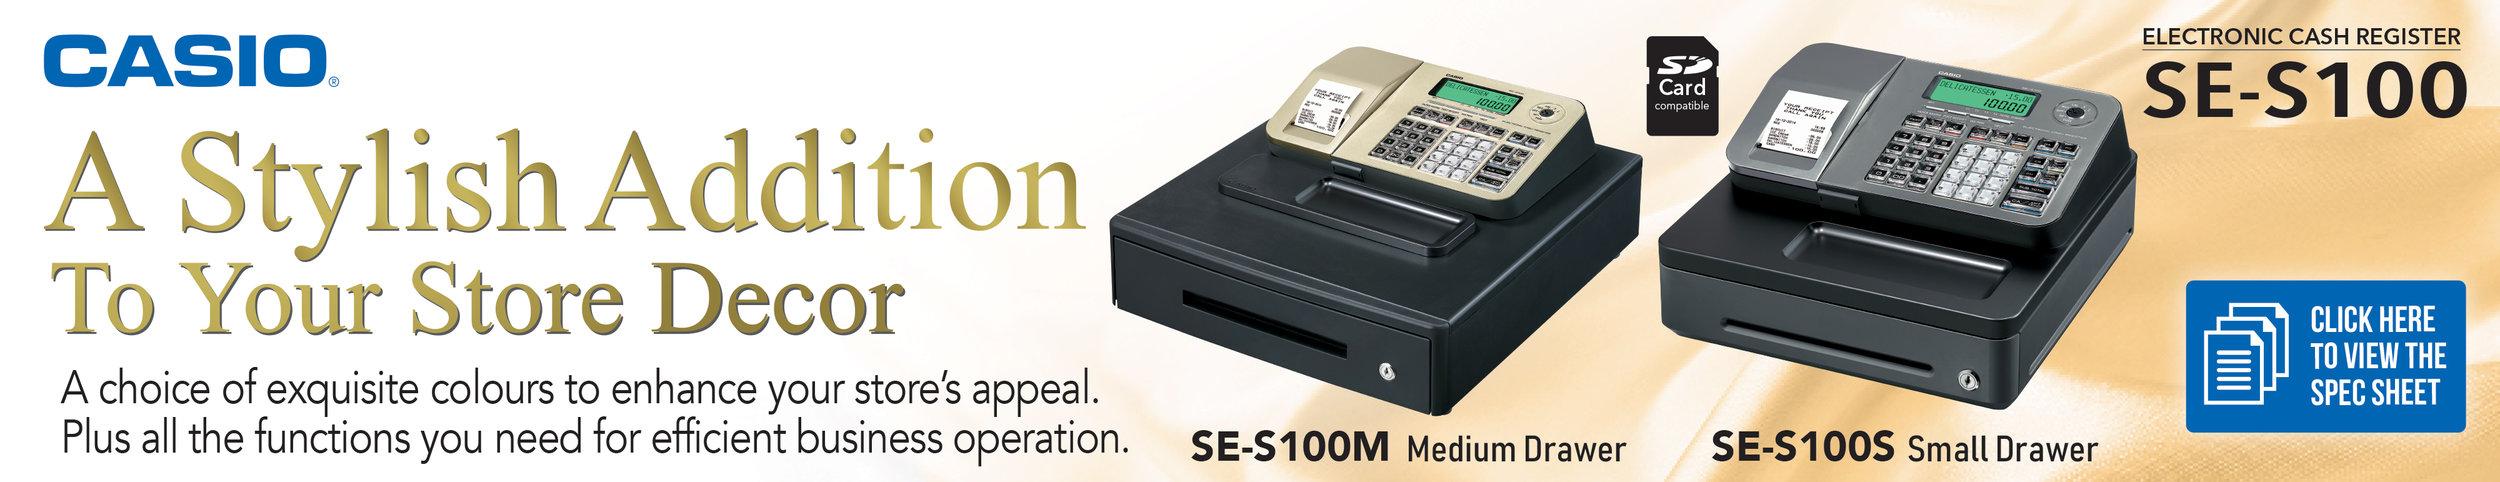 Casio_SE-S100_Web-banner_Spec-Sheet.jpg